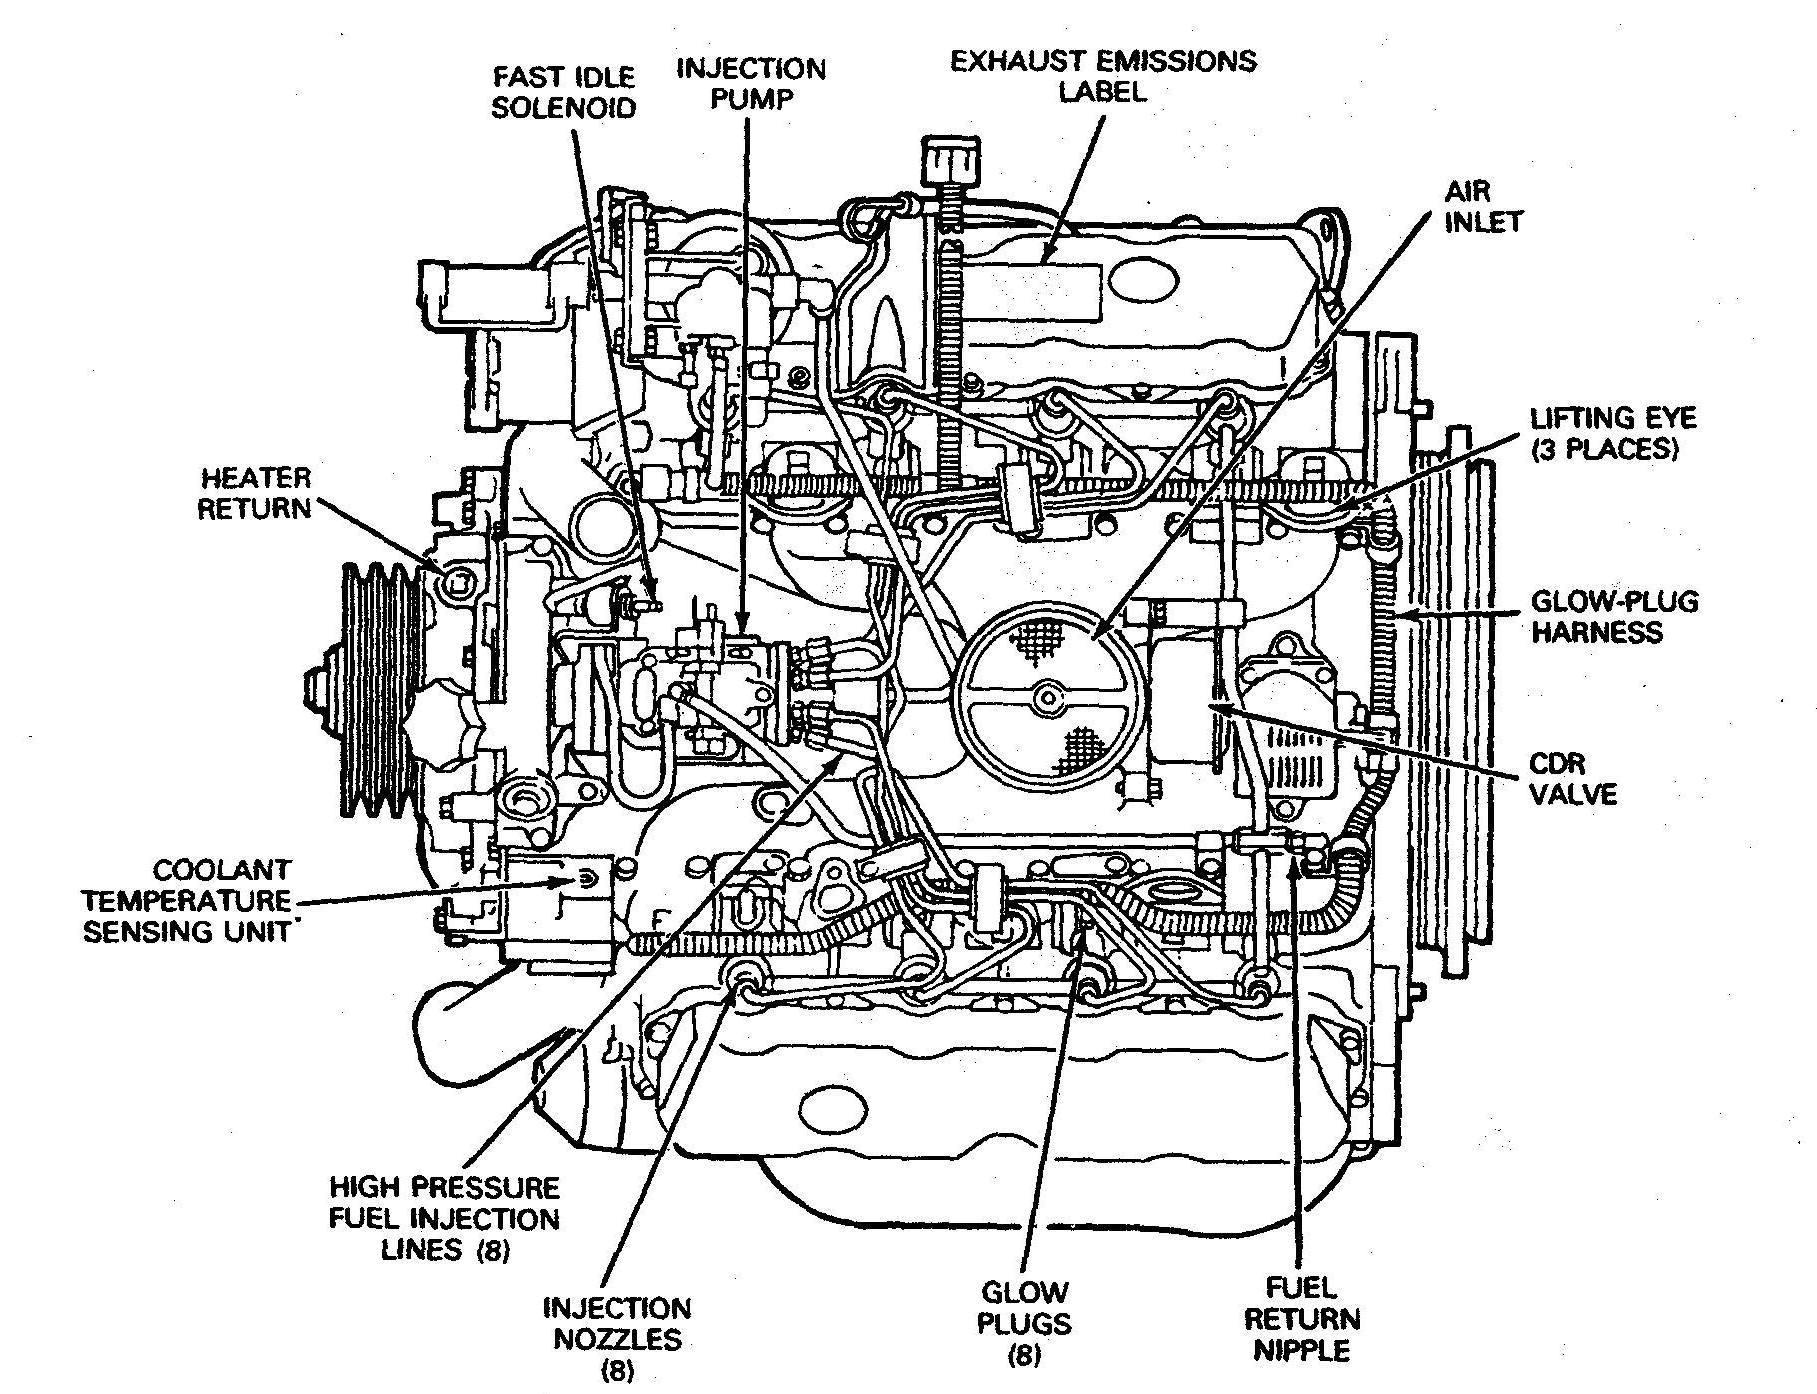 1988 f350 glow plug wiring harness